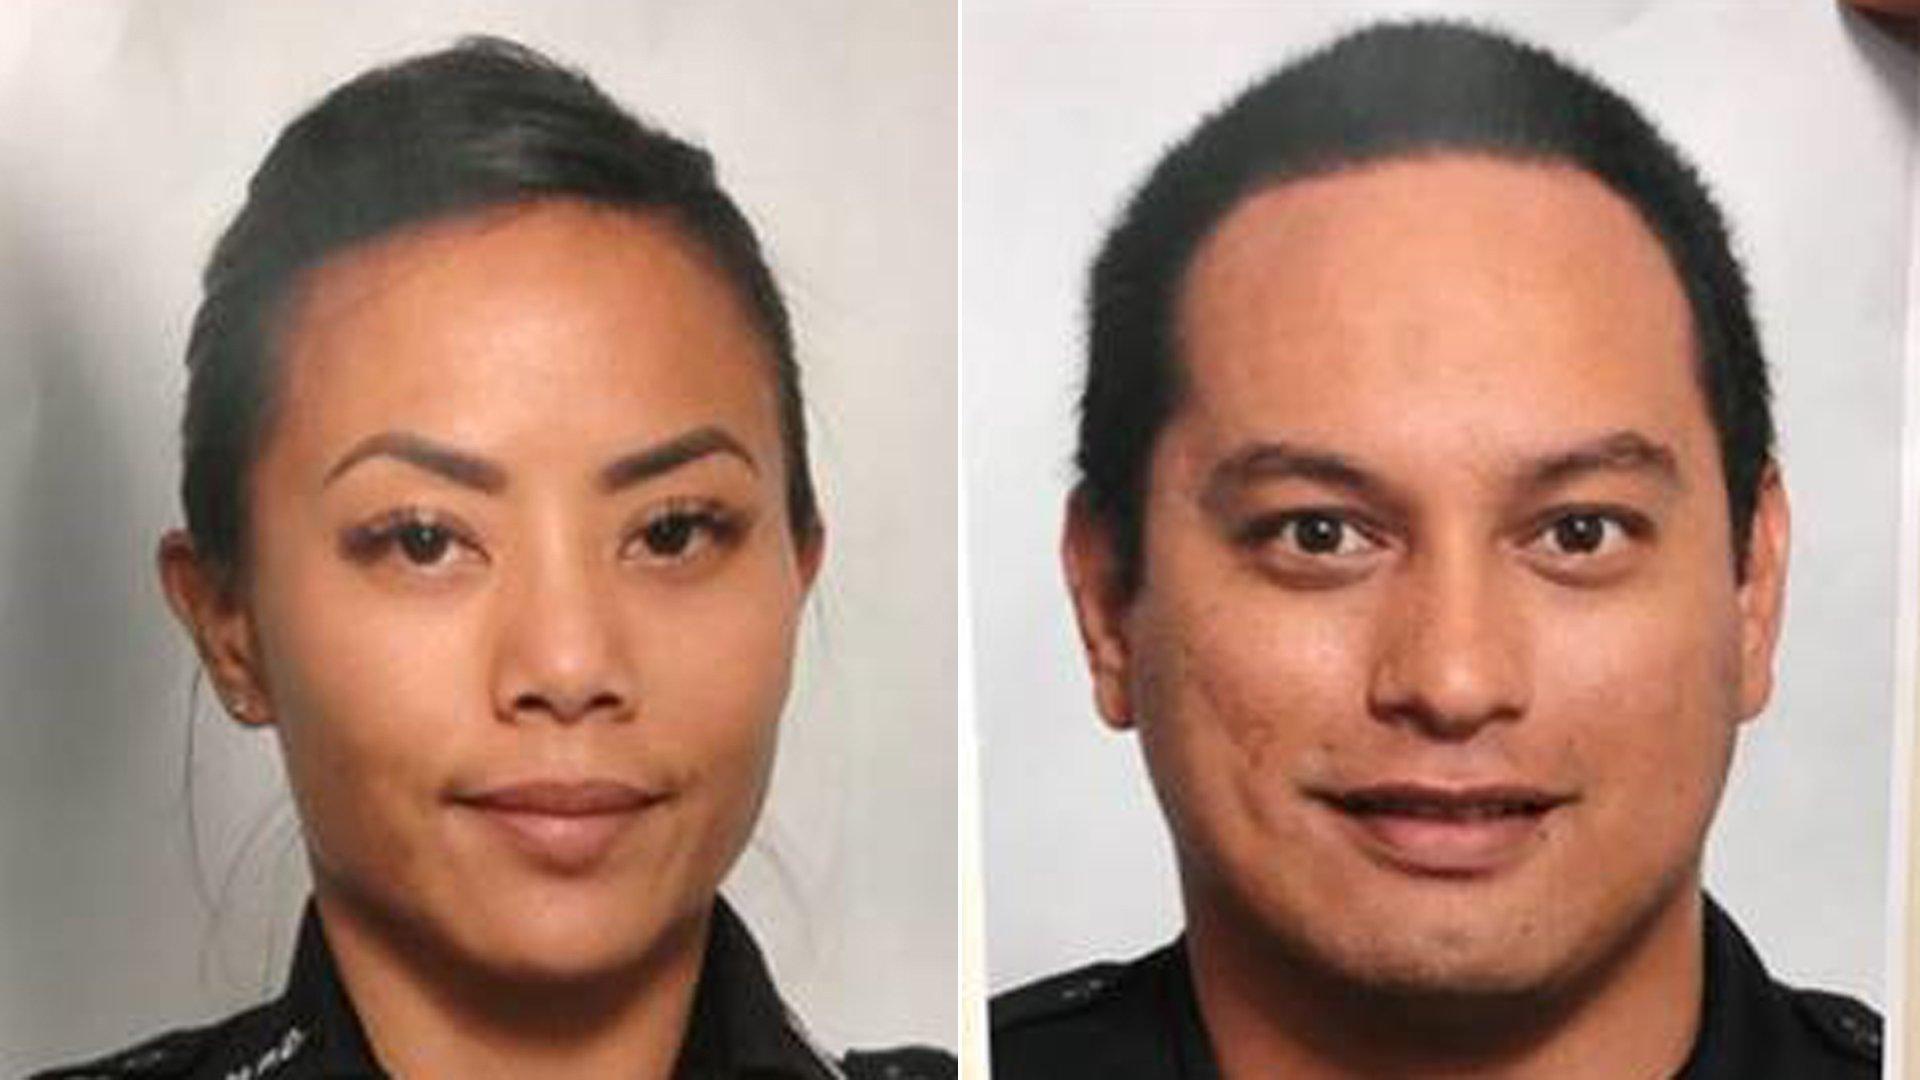 Honolulu police officers Tiffany Enriquez and Kaulike Kalama were killed in a shooting on Jan. 19, 2020. (Credit: Honolulu Police Department via CNN)